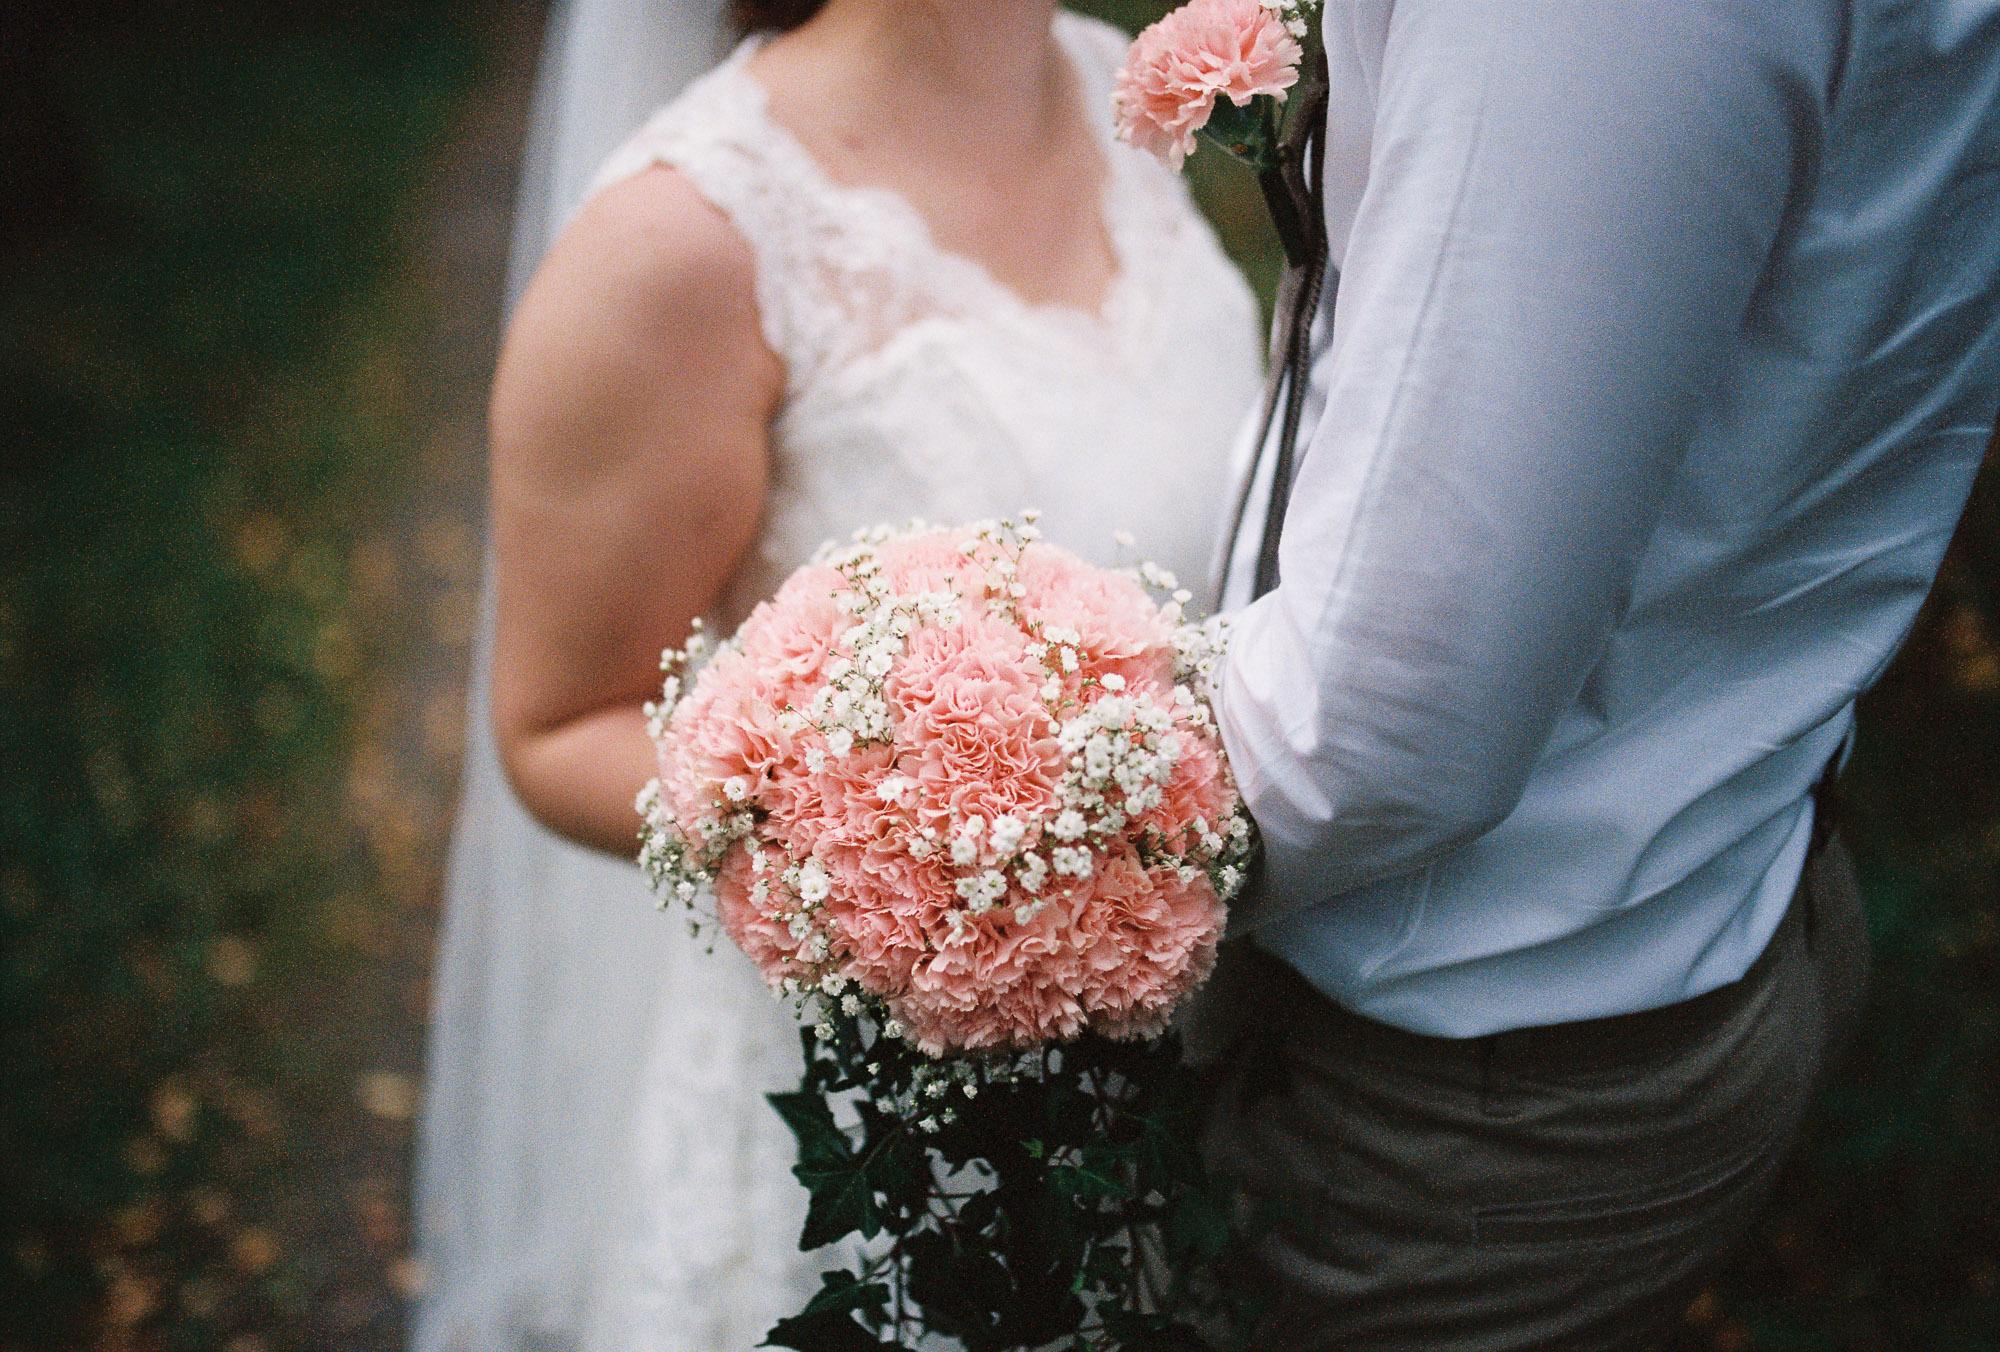 jere-satamo-analog-film-wedding-photographer-finland-079.jpg